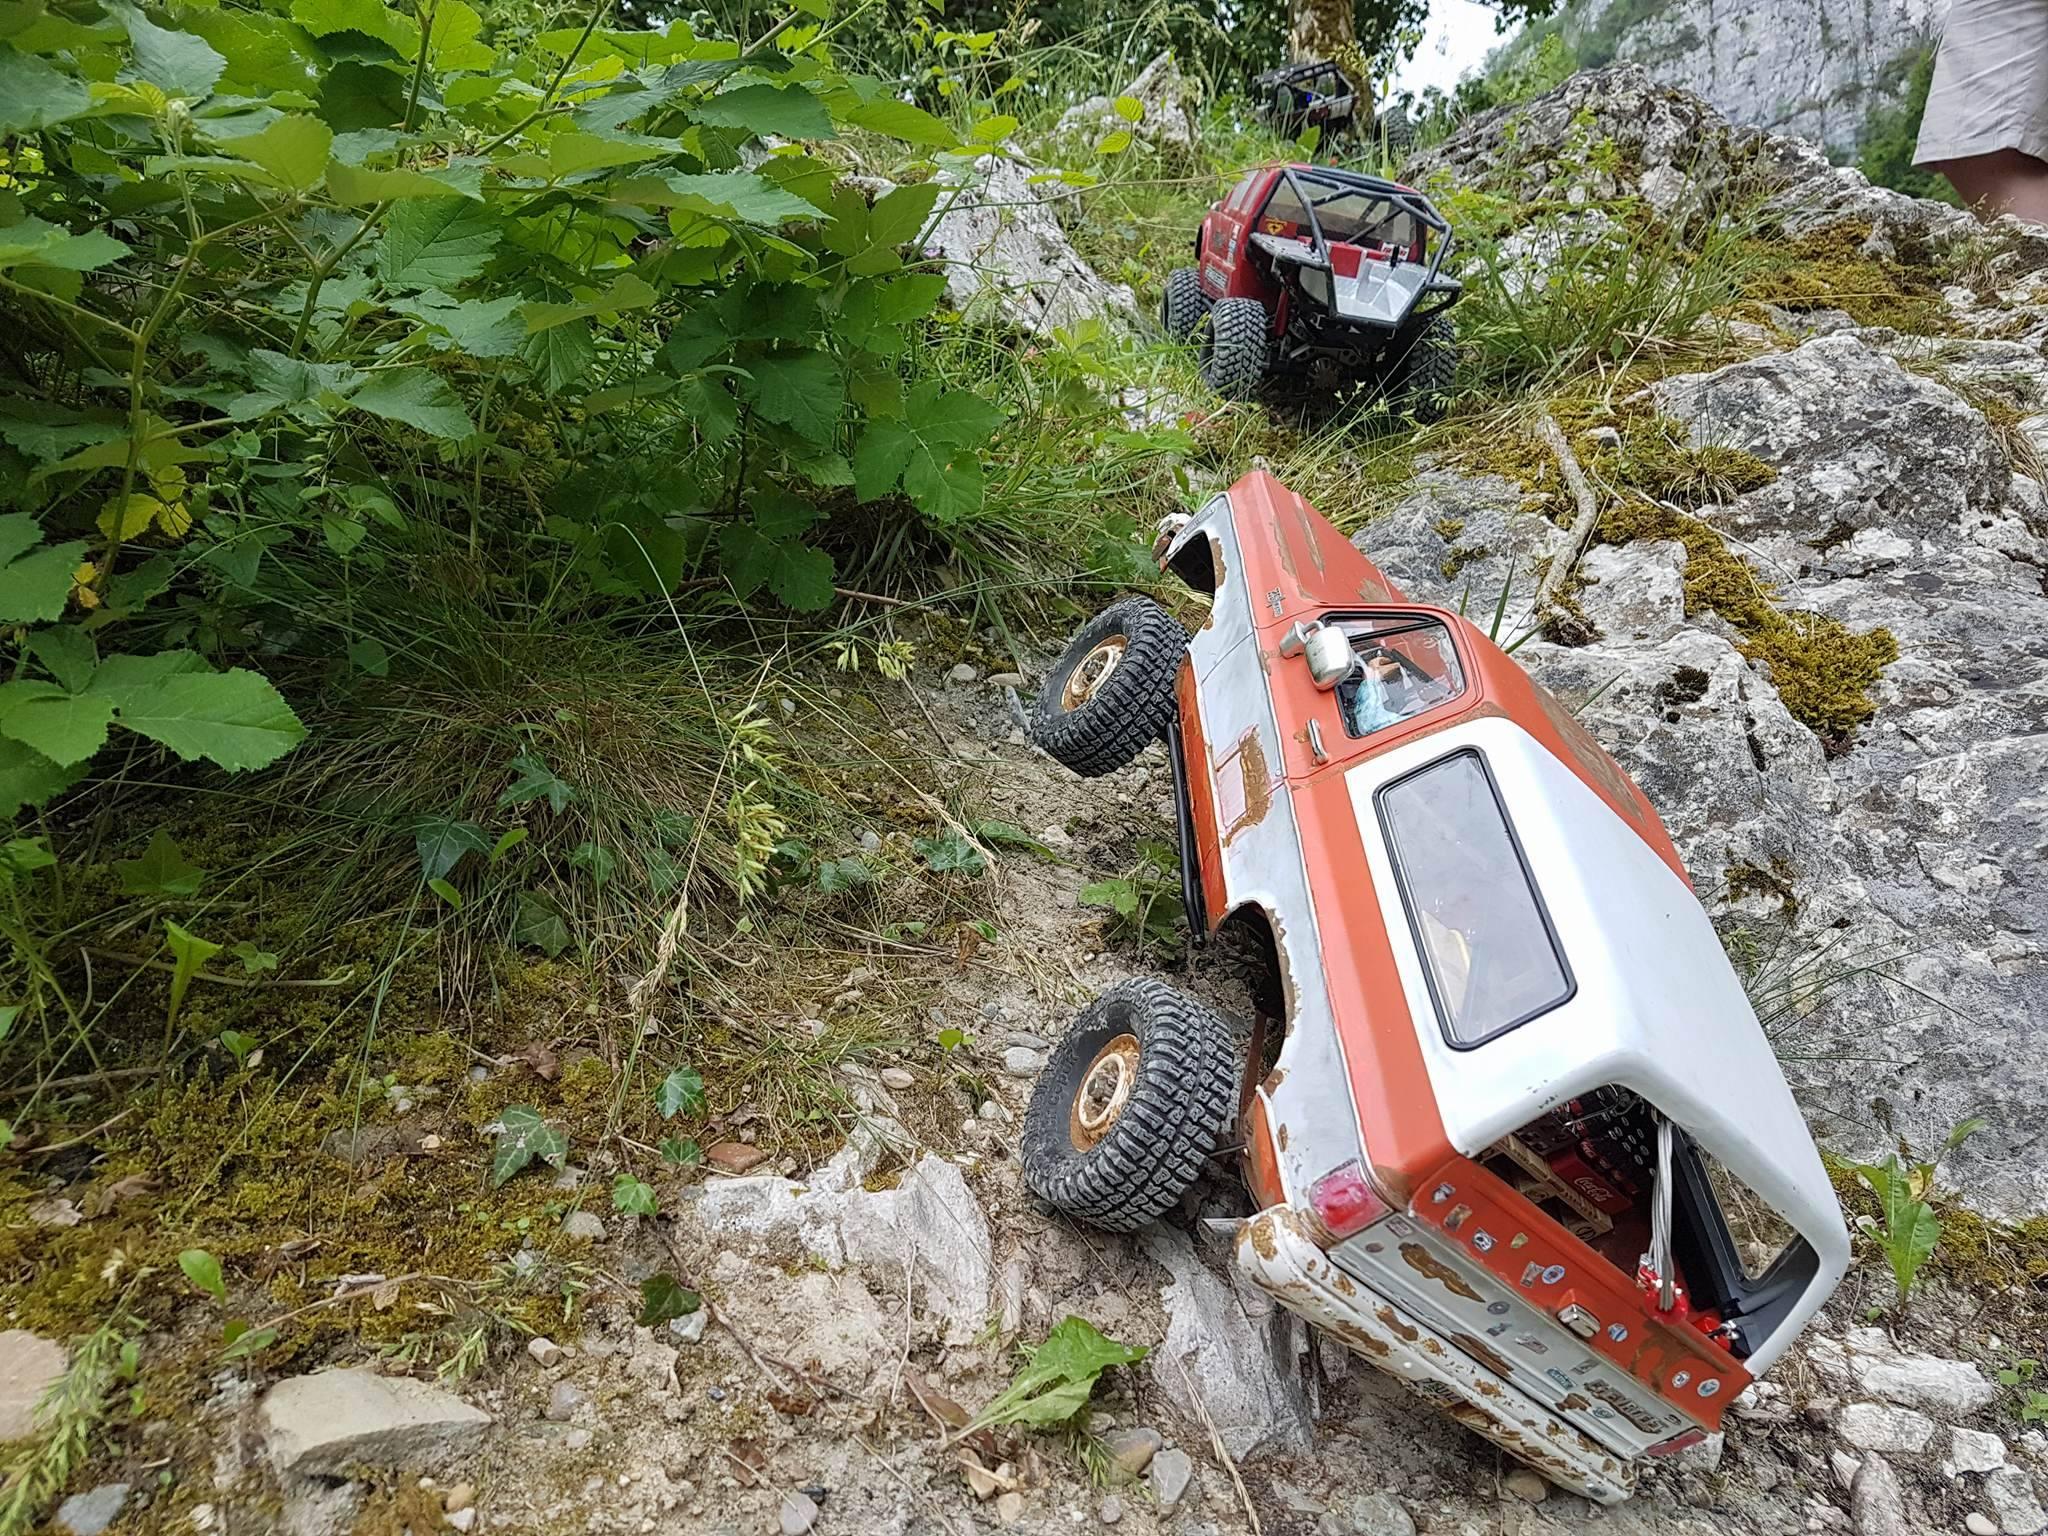 Farm Truck Chevrolet Blazer K5 sur TF2, Road Trip ! - Page 3 5621981940157813034323664419701308282972o